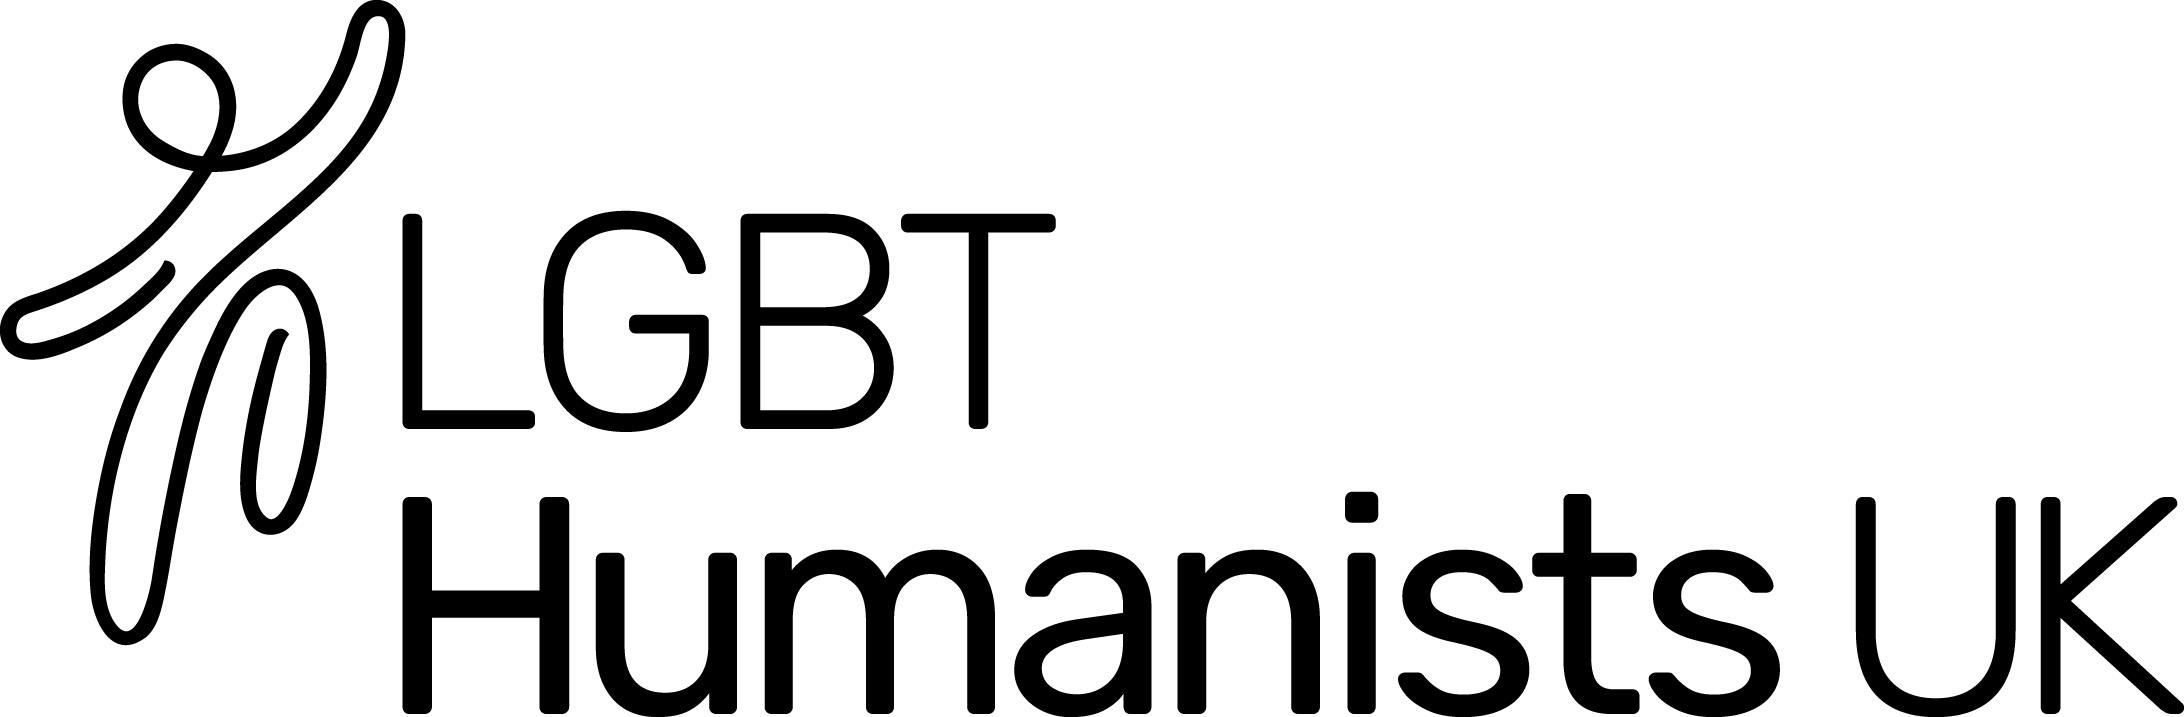 Humanists.jpg